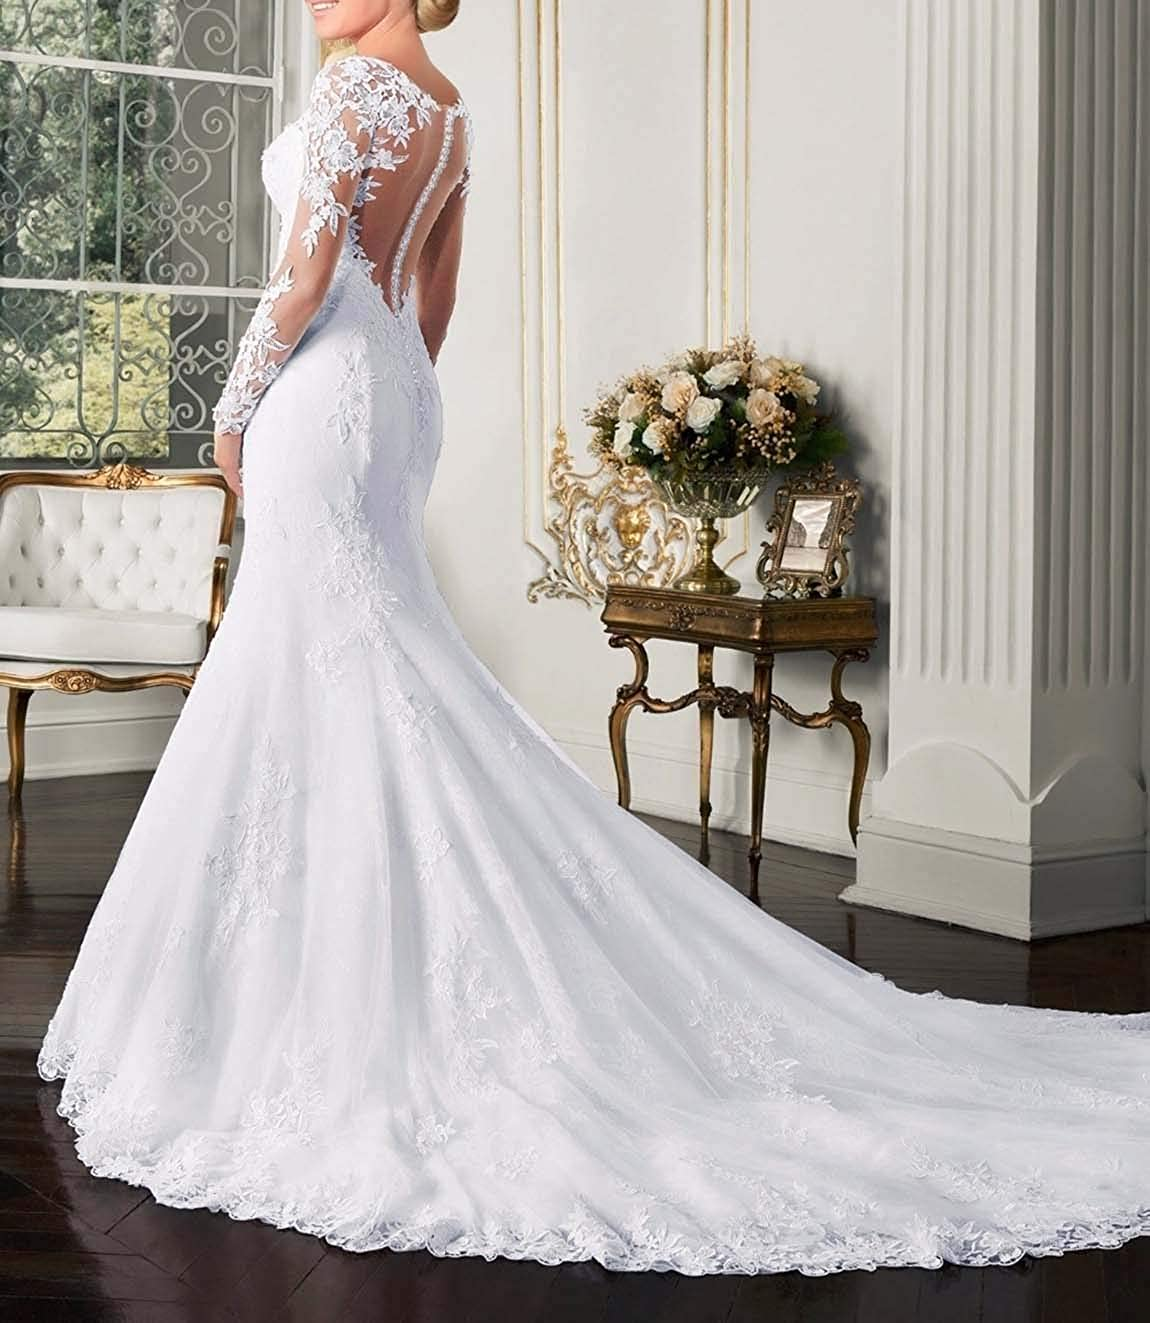 Amazon Com Fashionbride Women S Long Sleeves Mermaid Wedding Dresses For Bride 2020 See Through Back Bridal Gowns Clothing